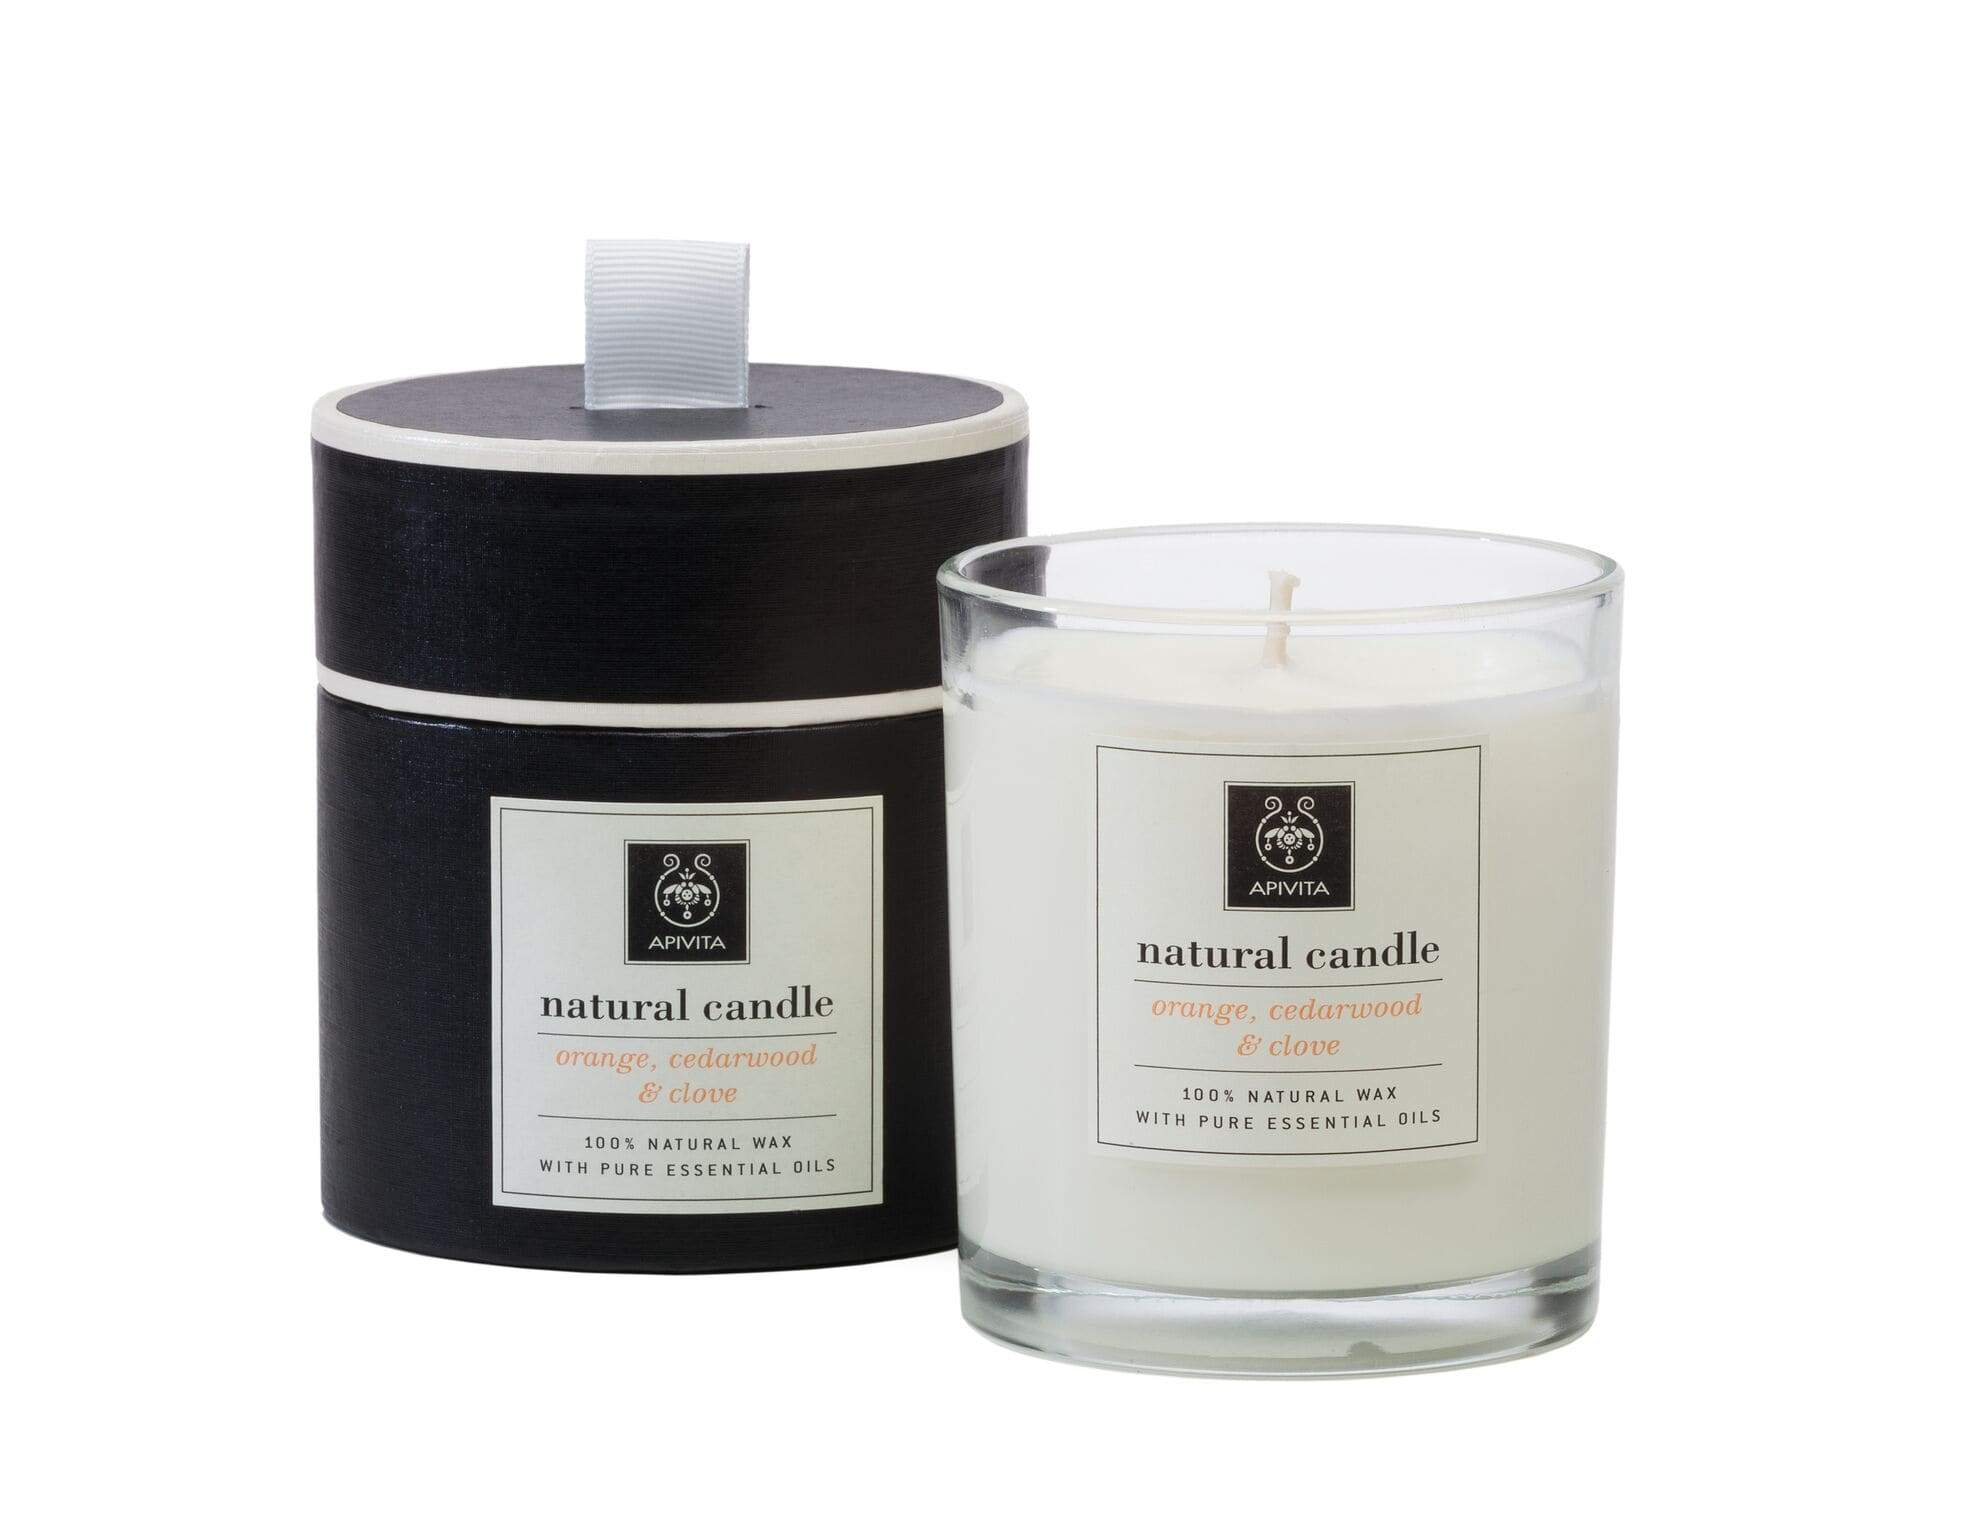 Apivita Natural Candle Orange, Cedarwood & Clove Φυσικό Κερί με αιθέρια έλαια από Πορτοκαλί, Σανδαλόξυλο & Γαρύφαλο, 235gr